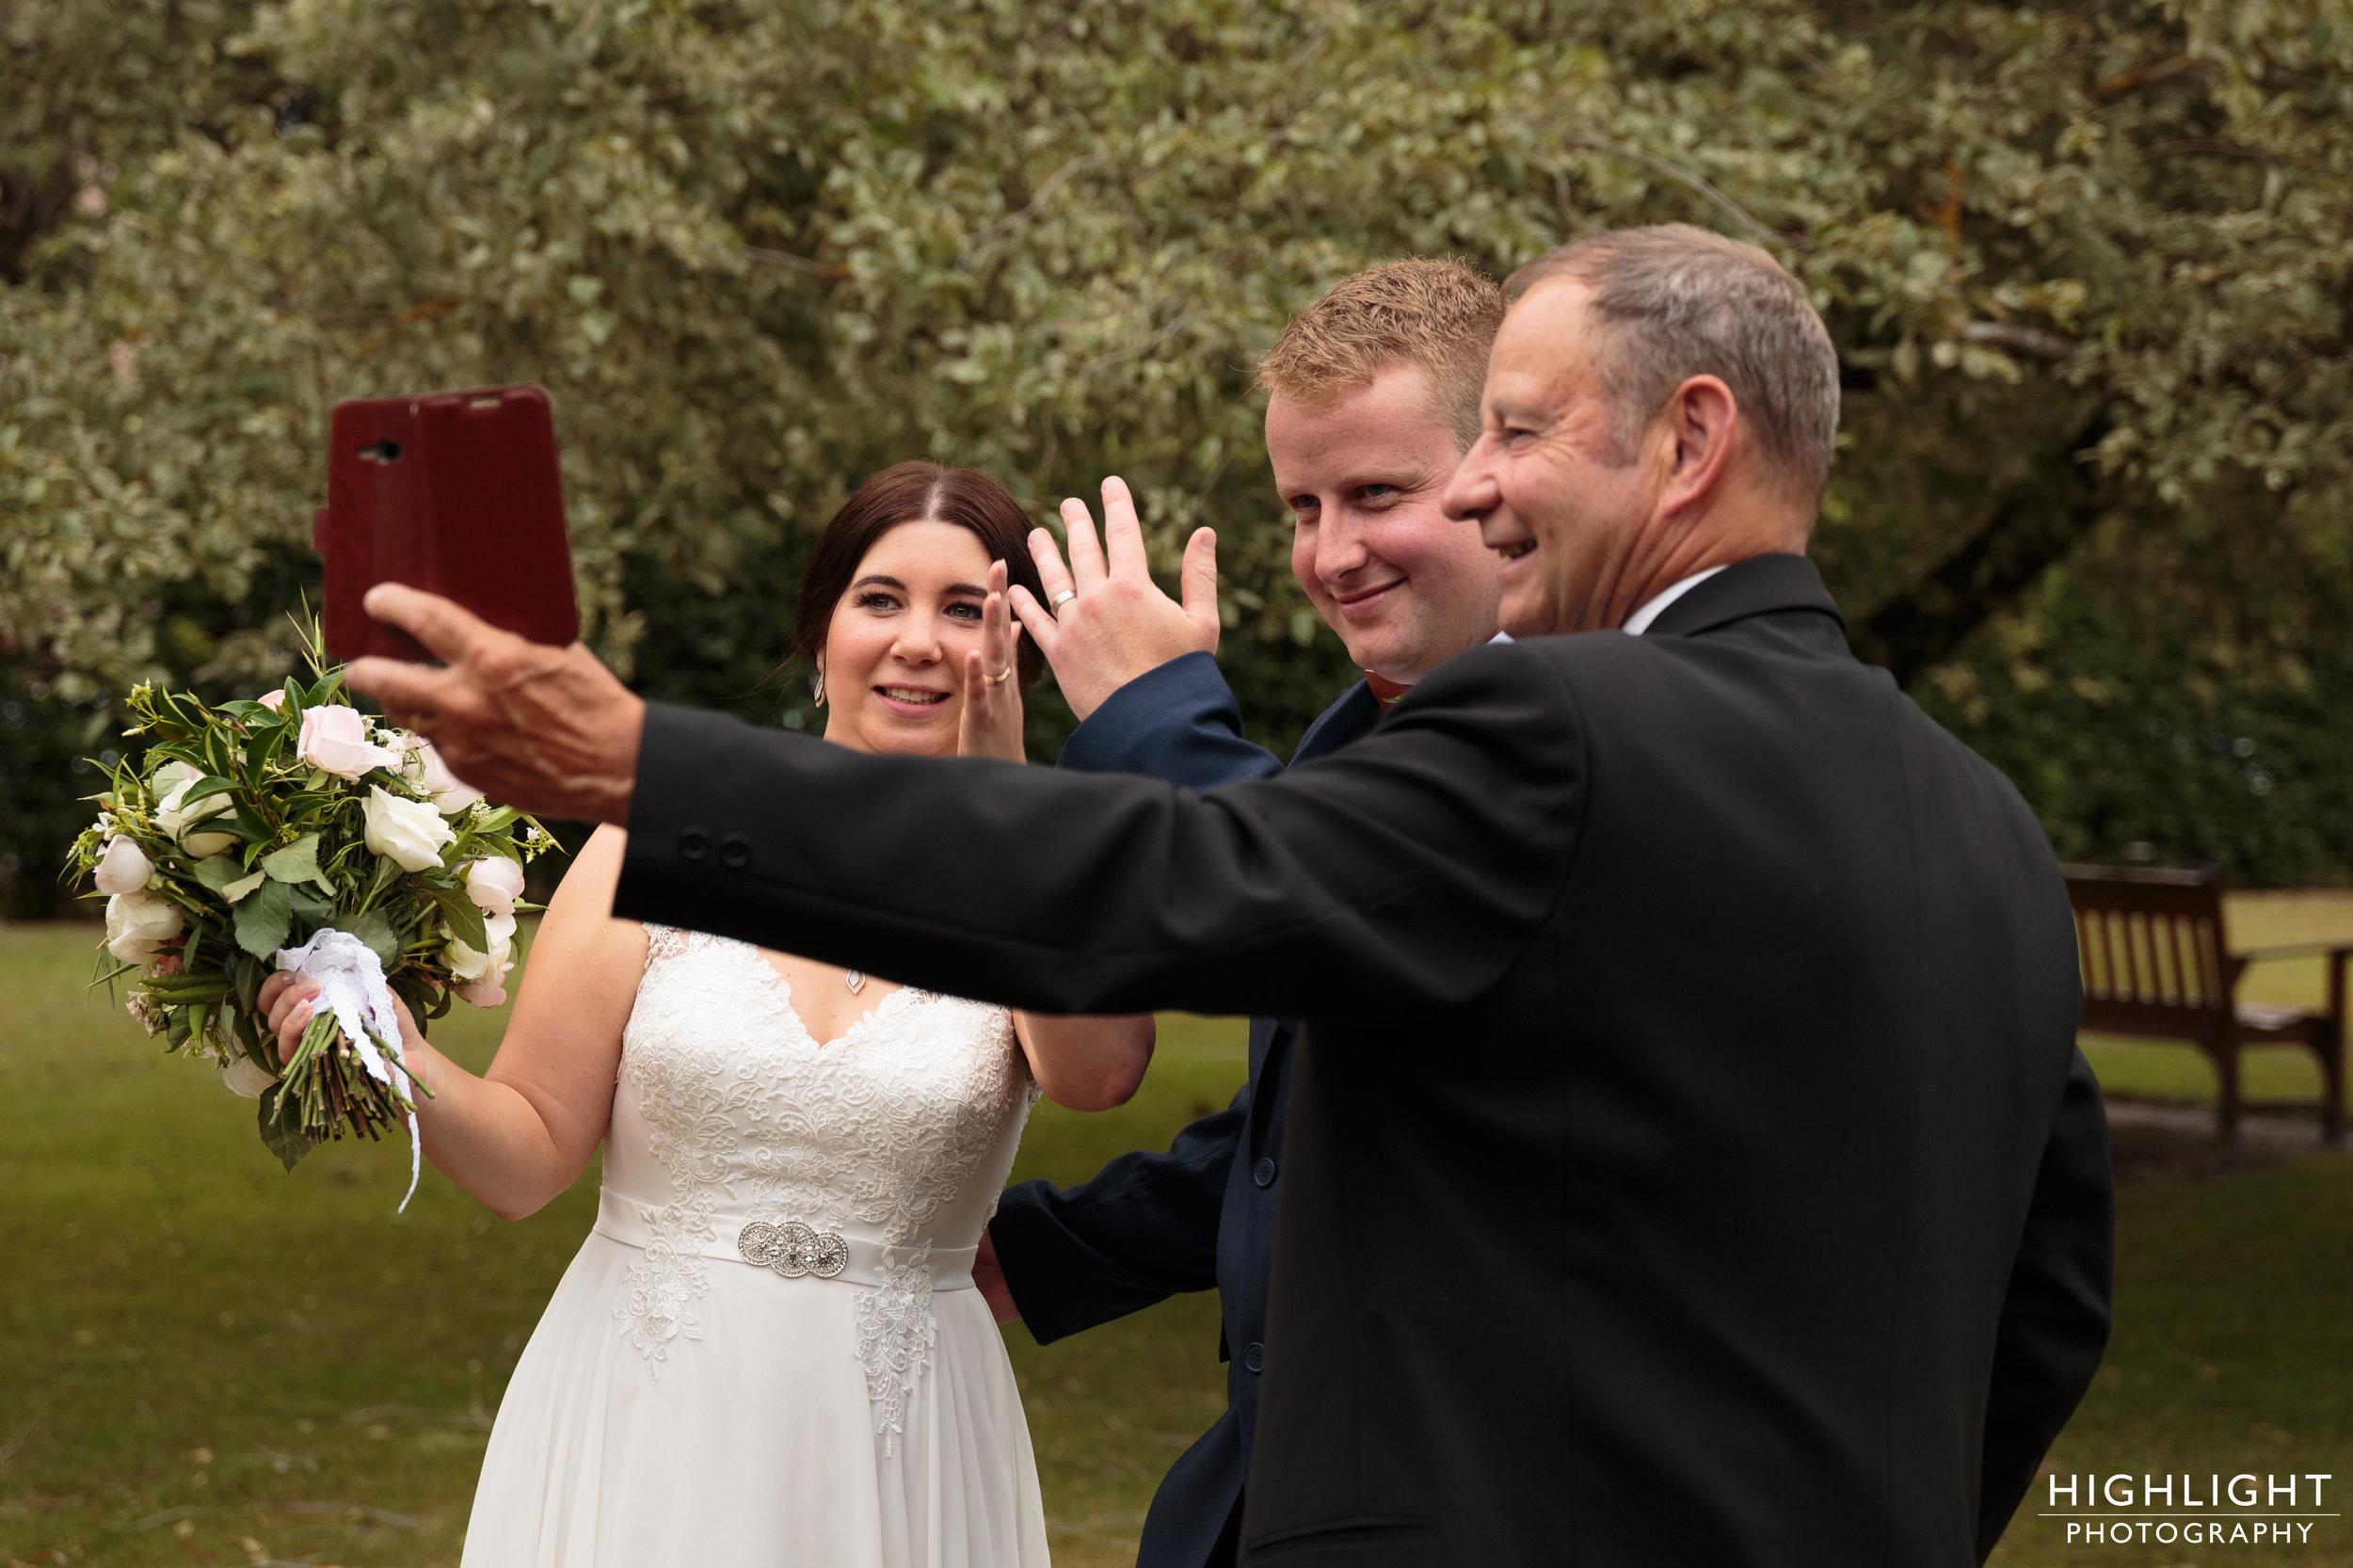 JM-2017-Highlight-wedding-photography-palmerston-north-new-zealand-93.jpg